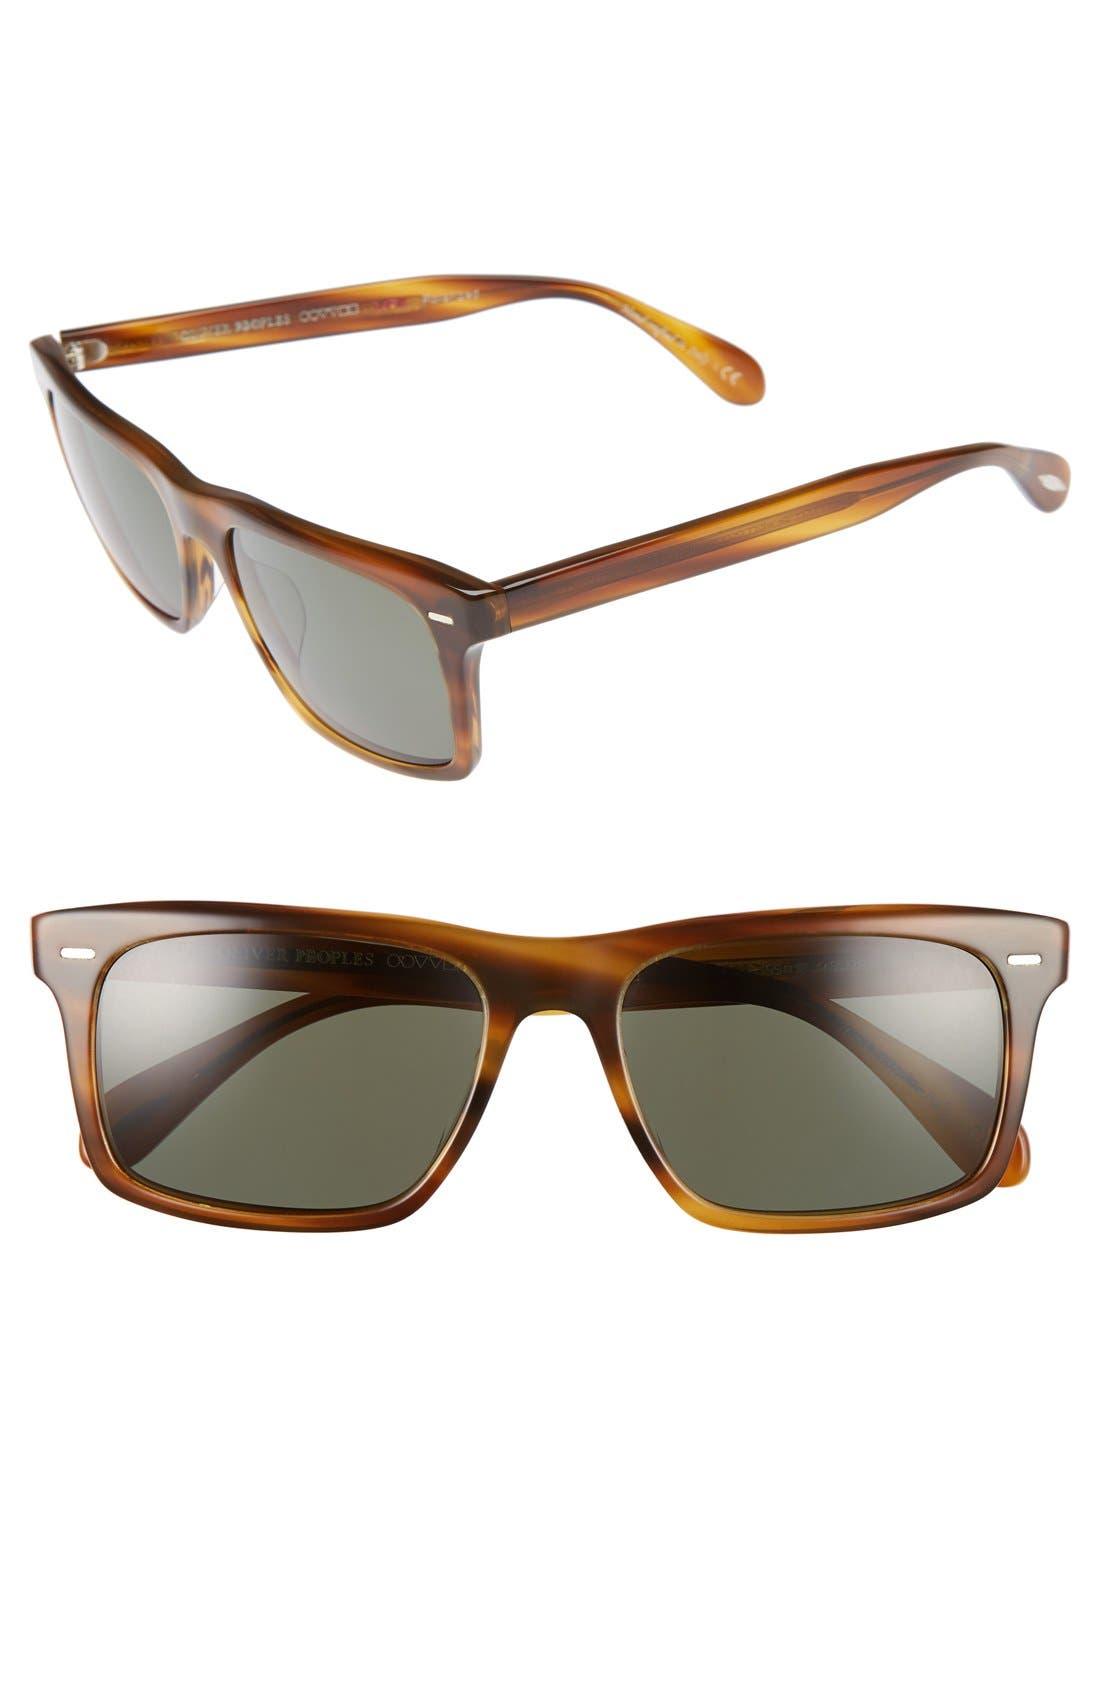 Oliver Peoples Brodsky 55mm Polarized Sunglasses